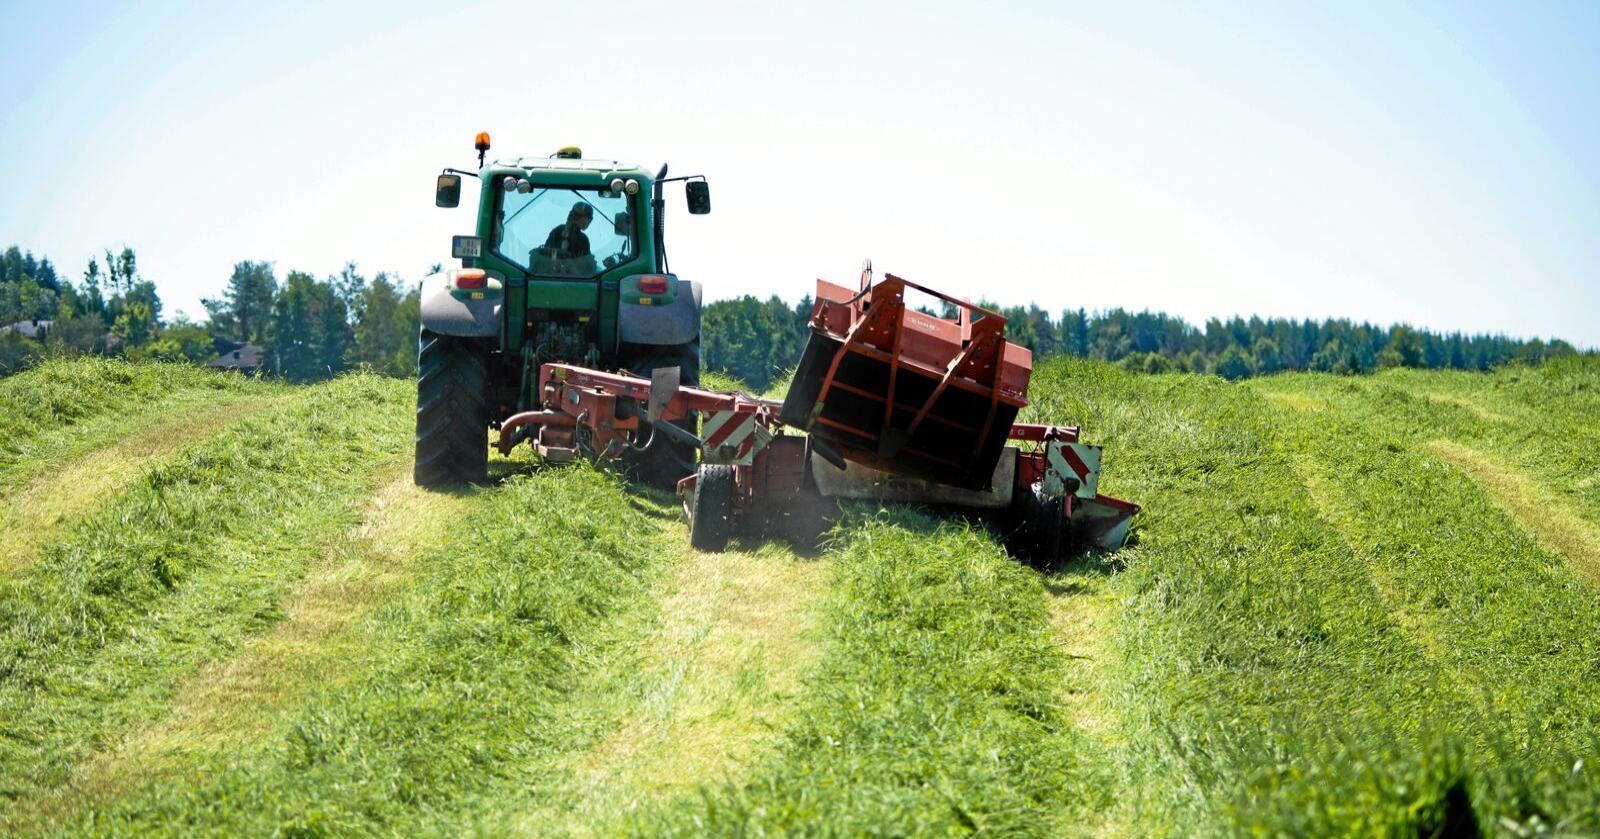 Skvises: Kan grasdyrking på kornjord (her i Akershus) få null tilskudd samtidig som gras i brattlendet like ved får fullt tilskudd? Ja, ifølge Nibio. Foto: Erling Fløistad